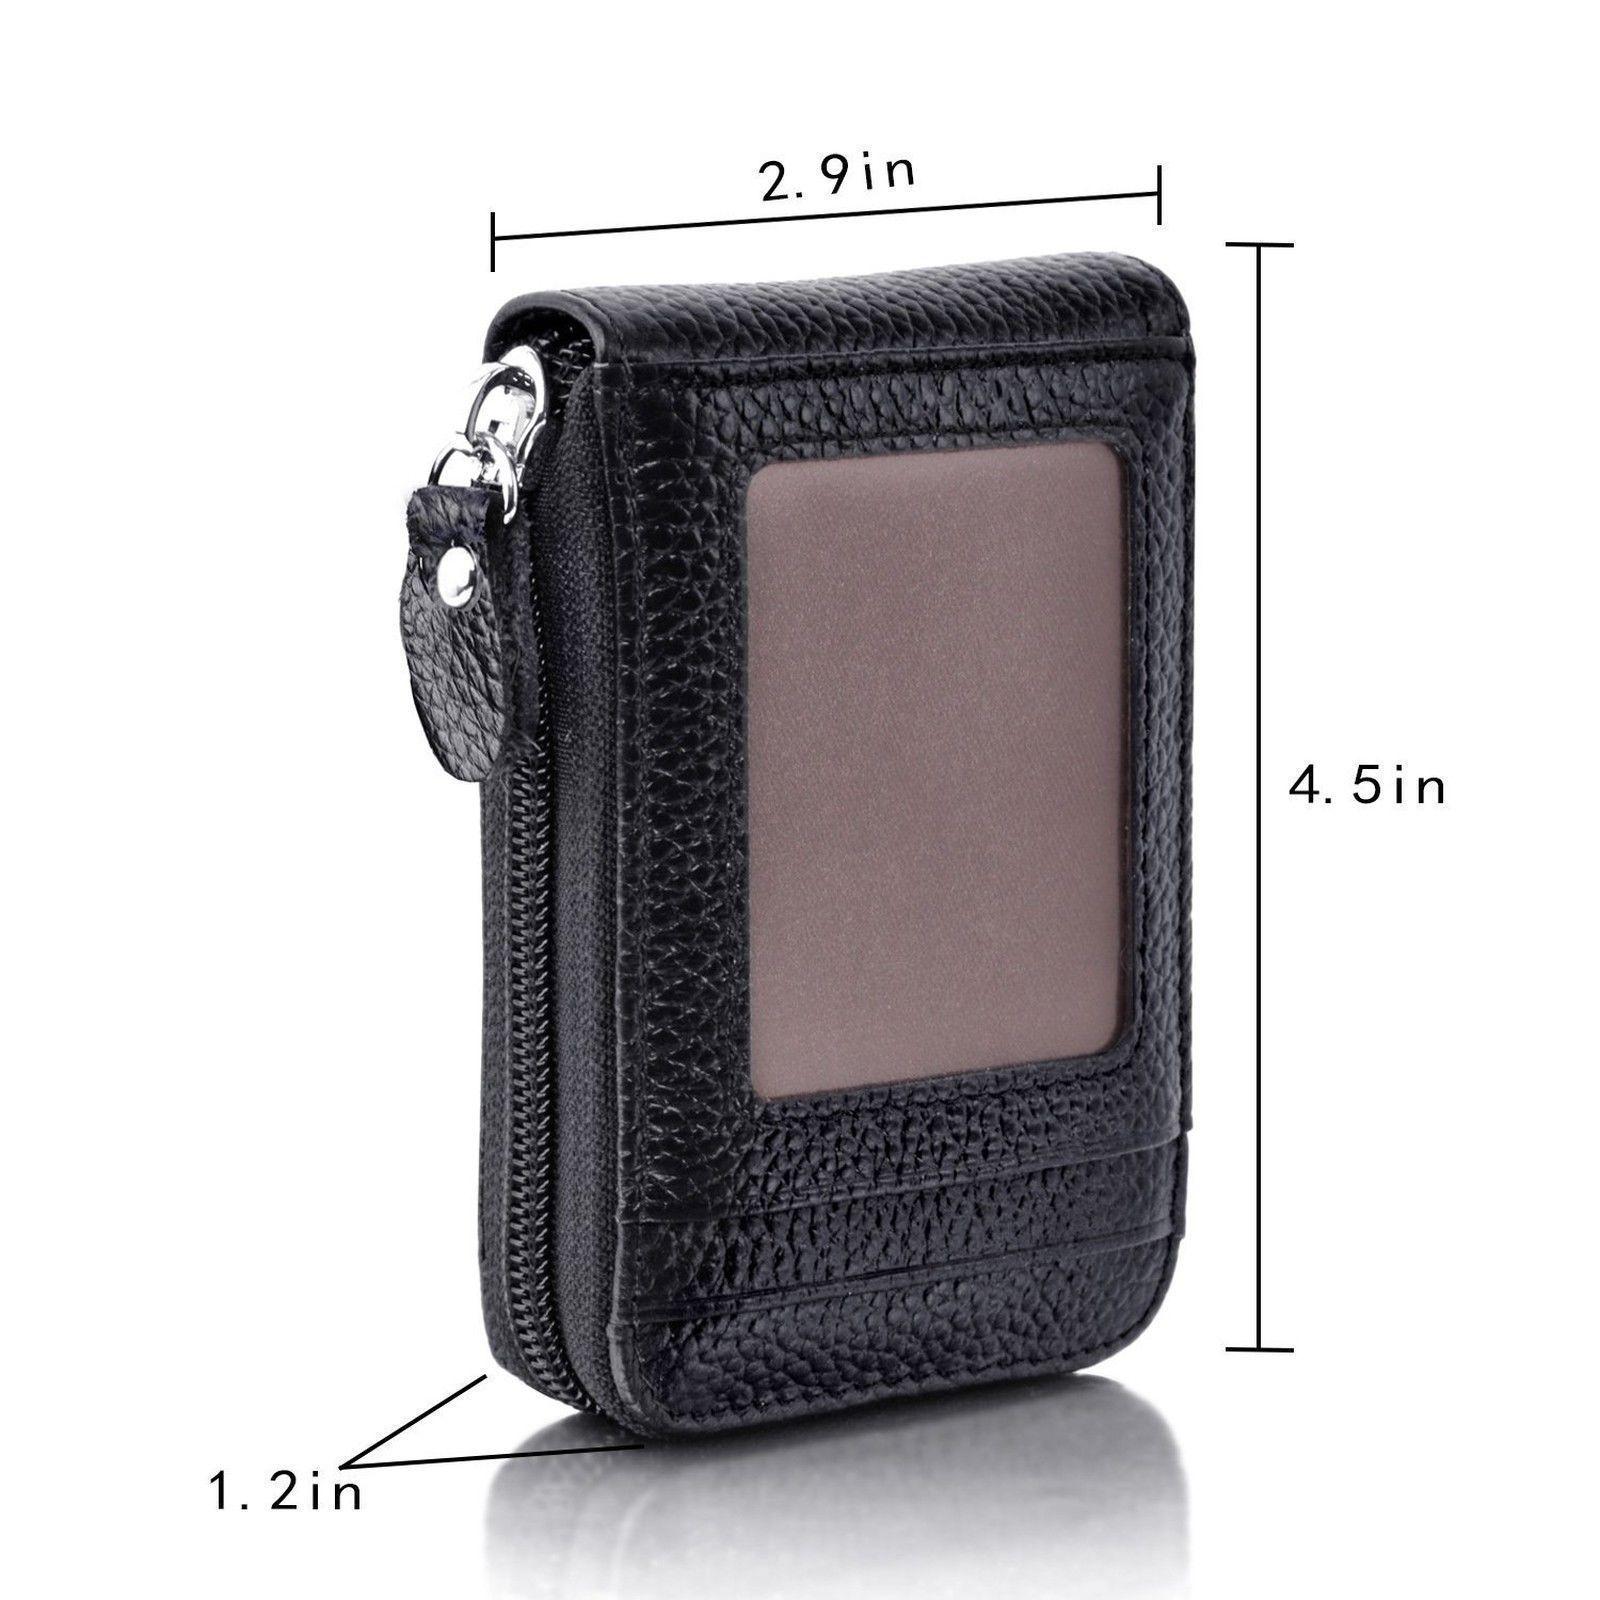 Купить с кэшбэком Men Wallet Bag Leather Credit Card Holder RFID Blocking Zipper Pocket Bags